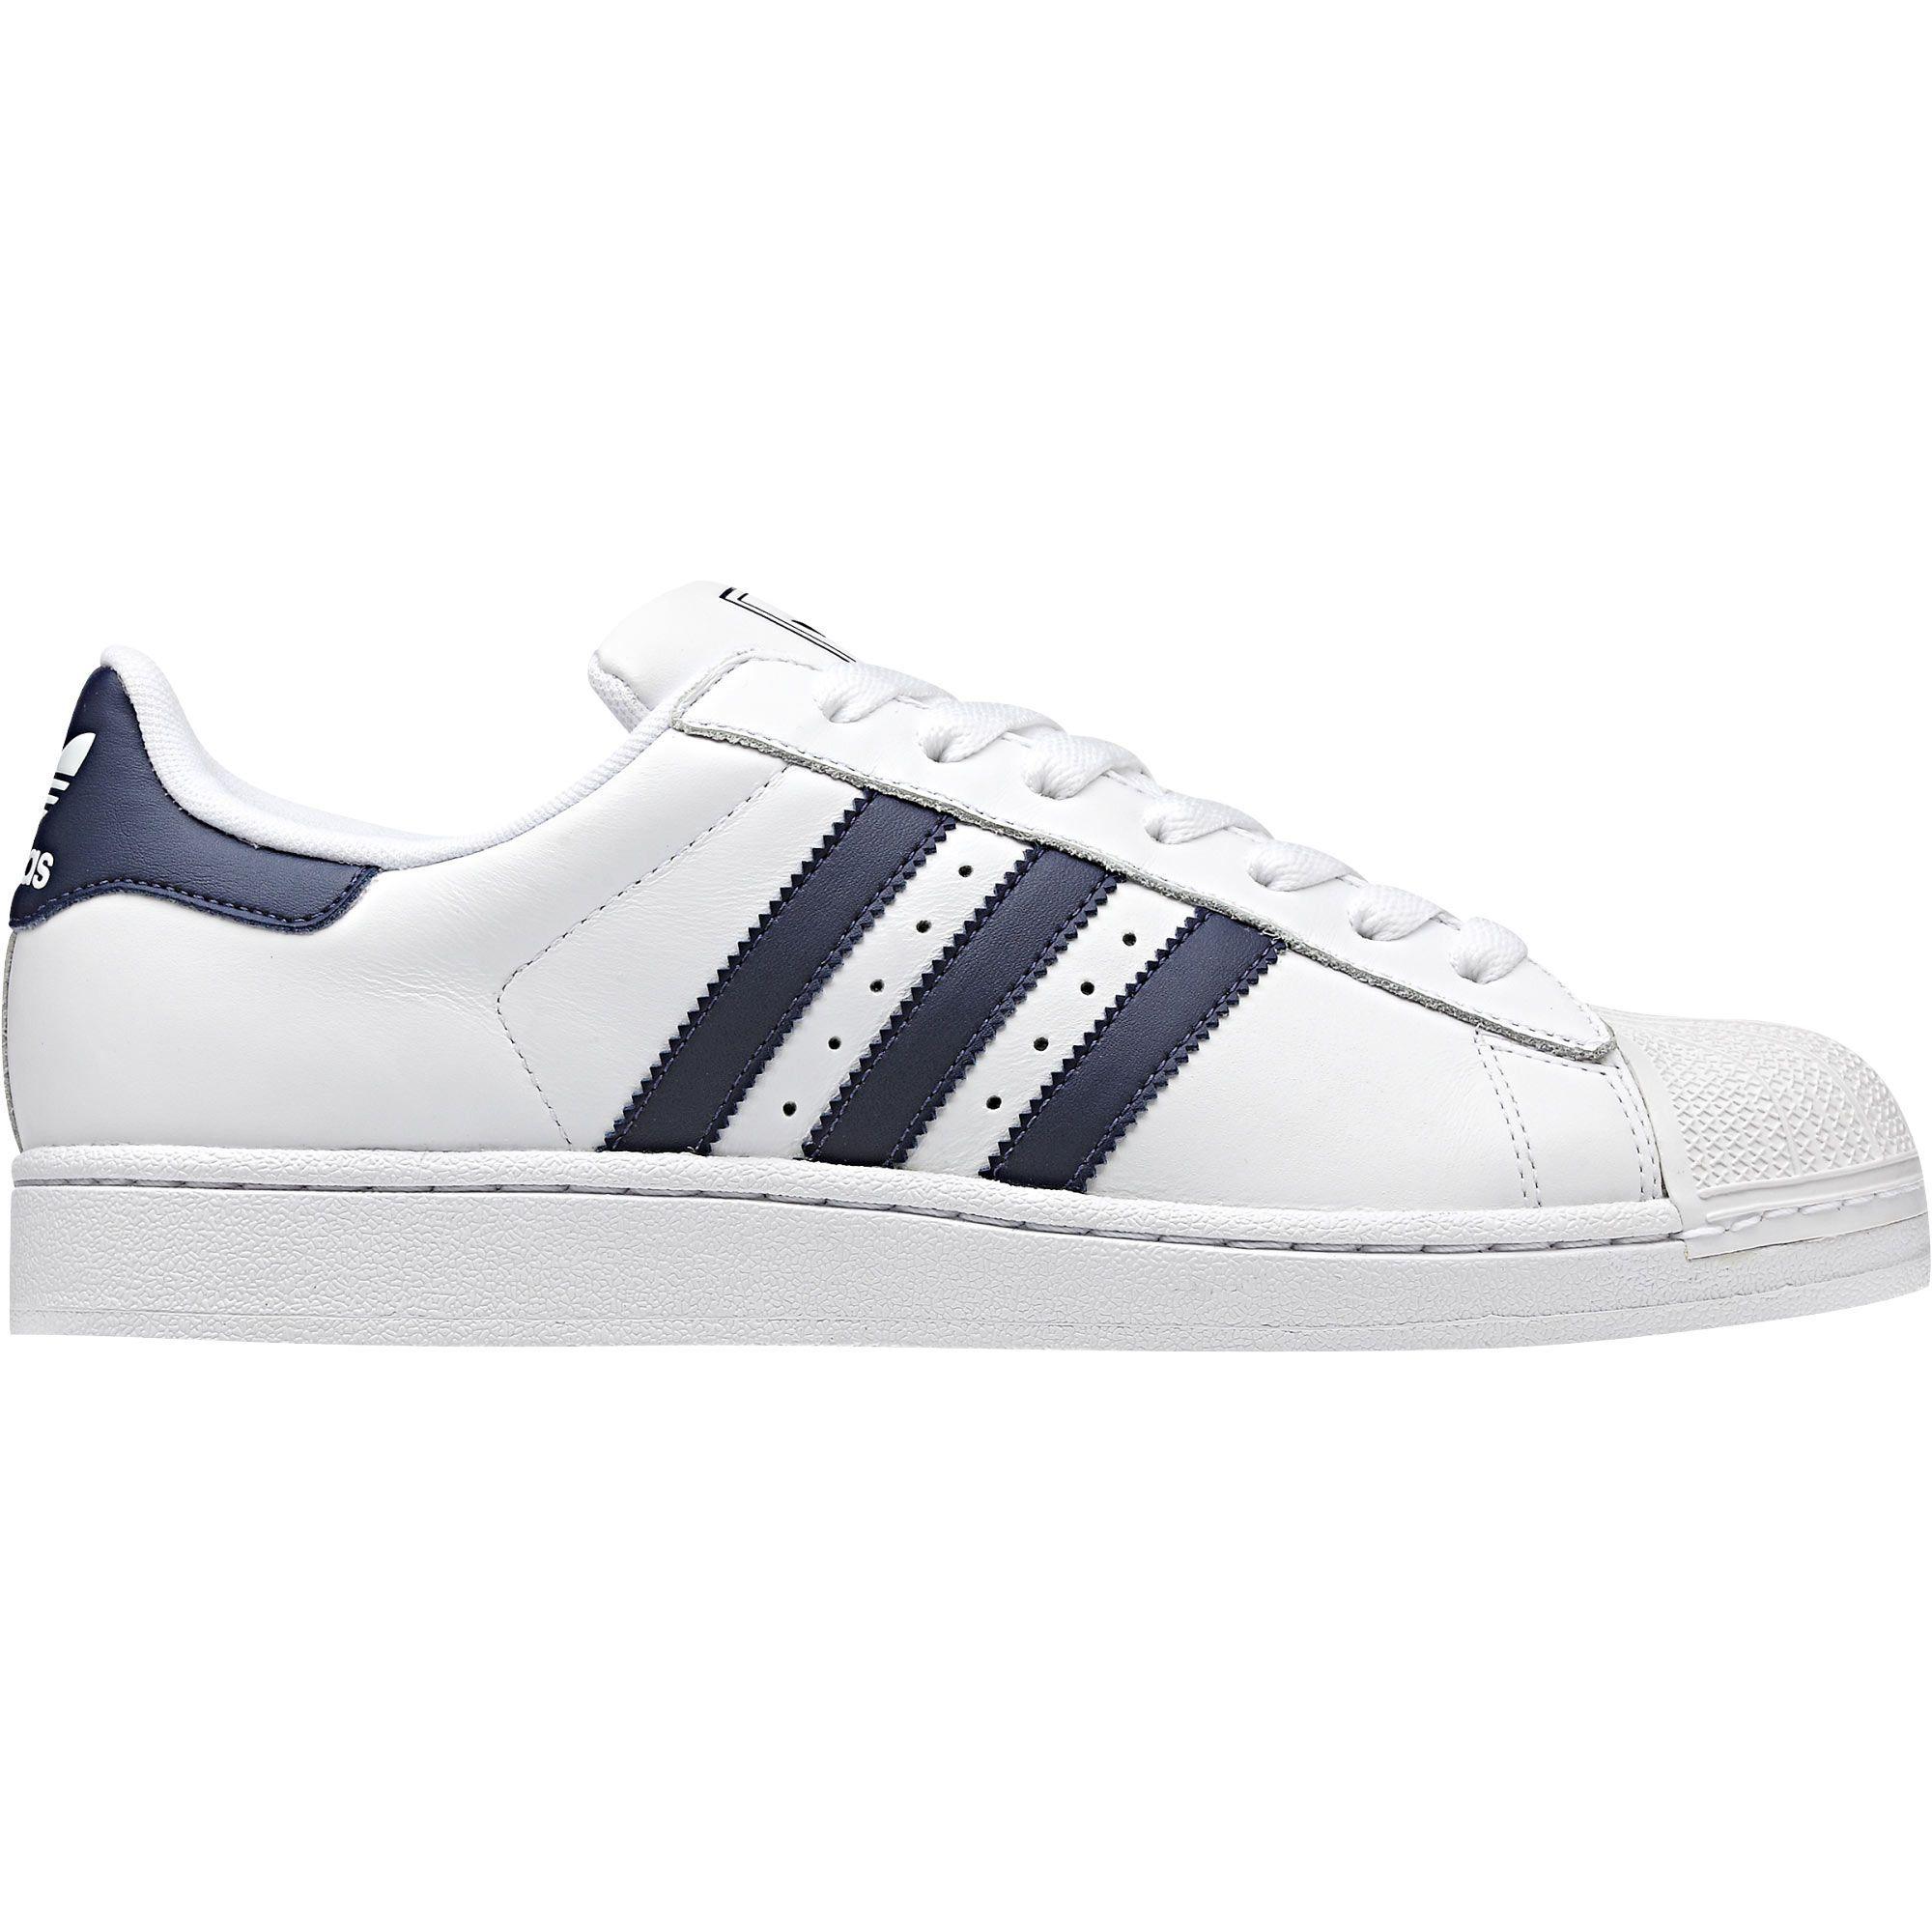 adidas superstar 2 bianco / blu navy adidas incredibile come